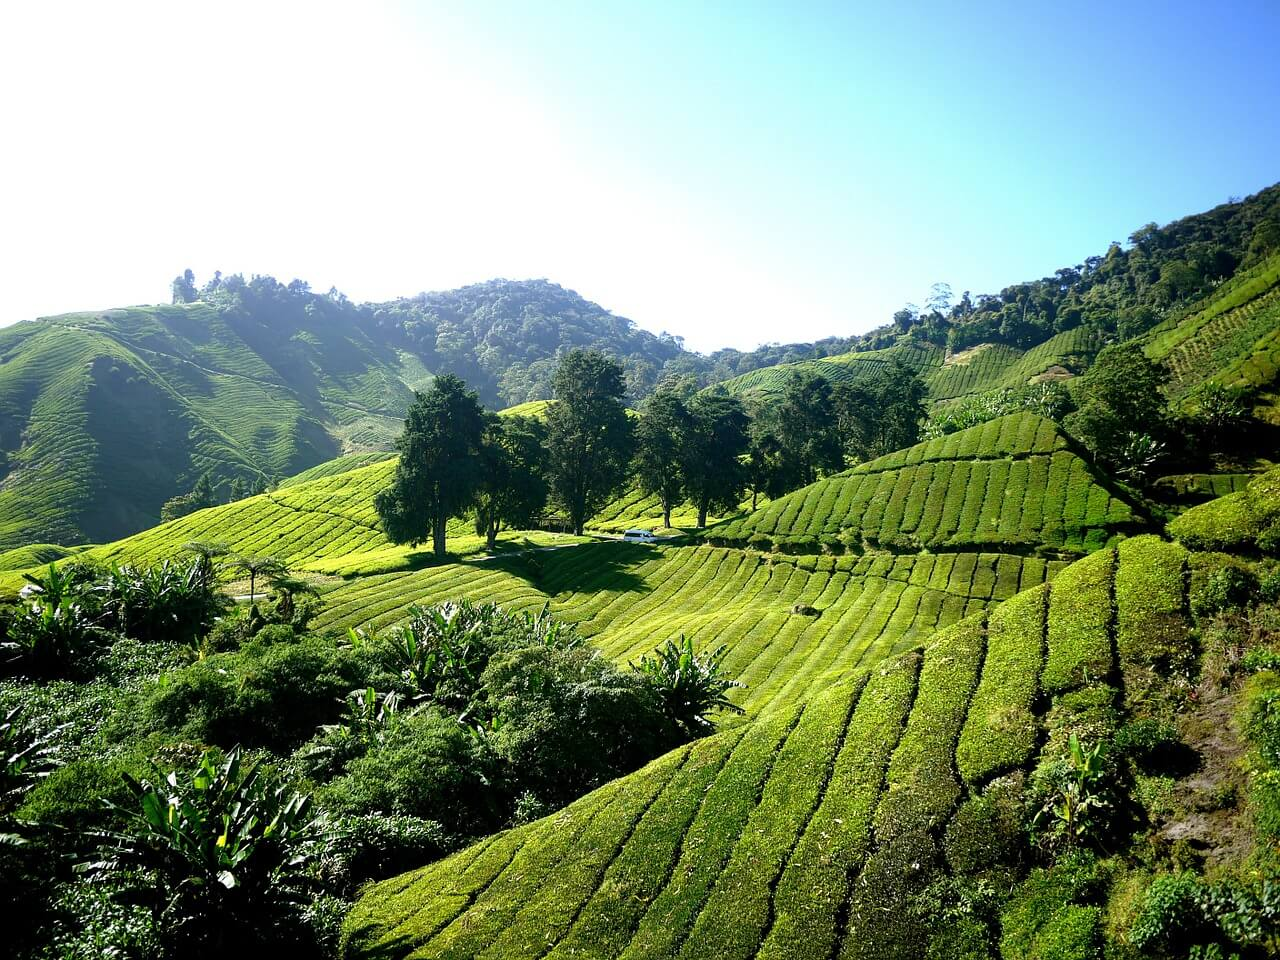 Bezoek Cameron Highlands – Maleisië